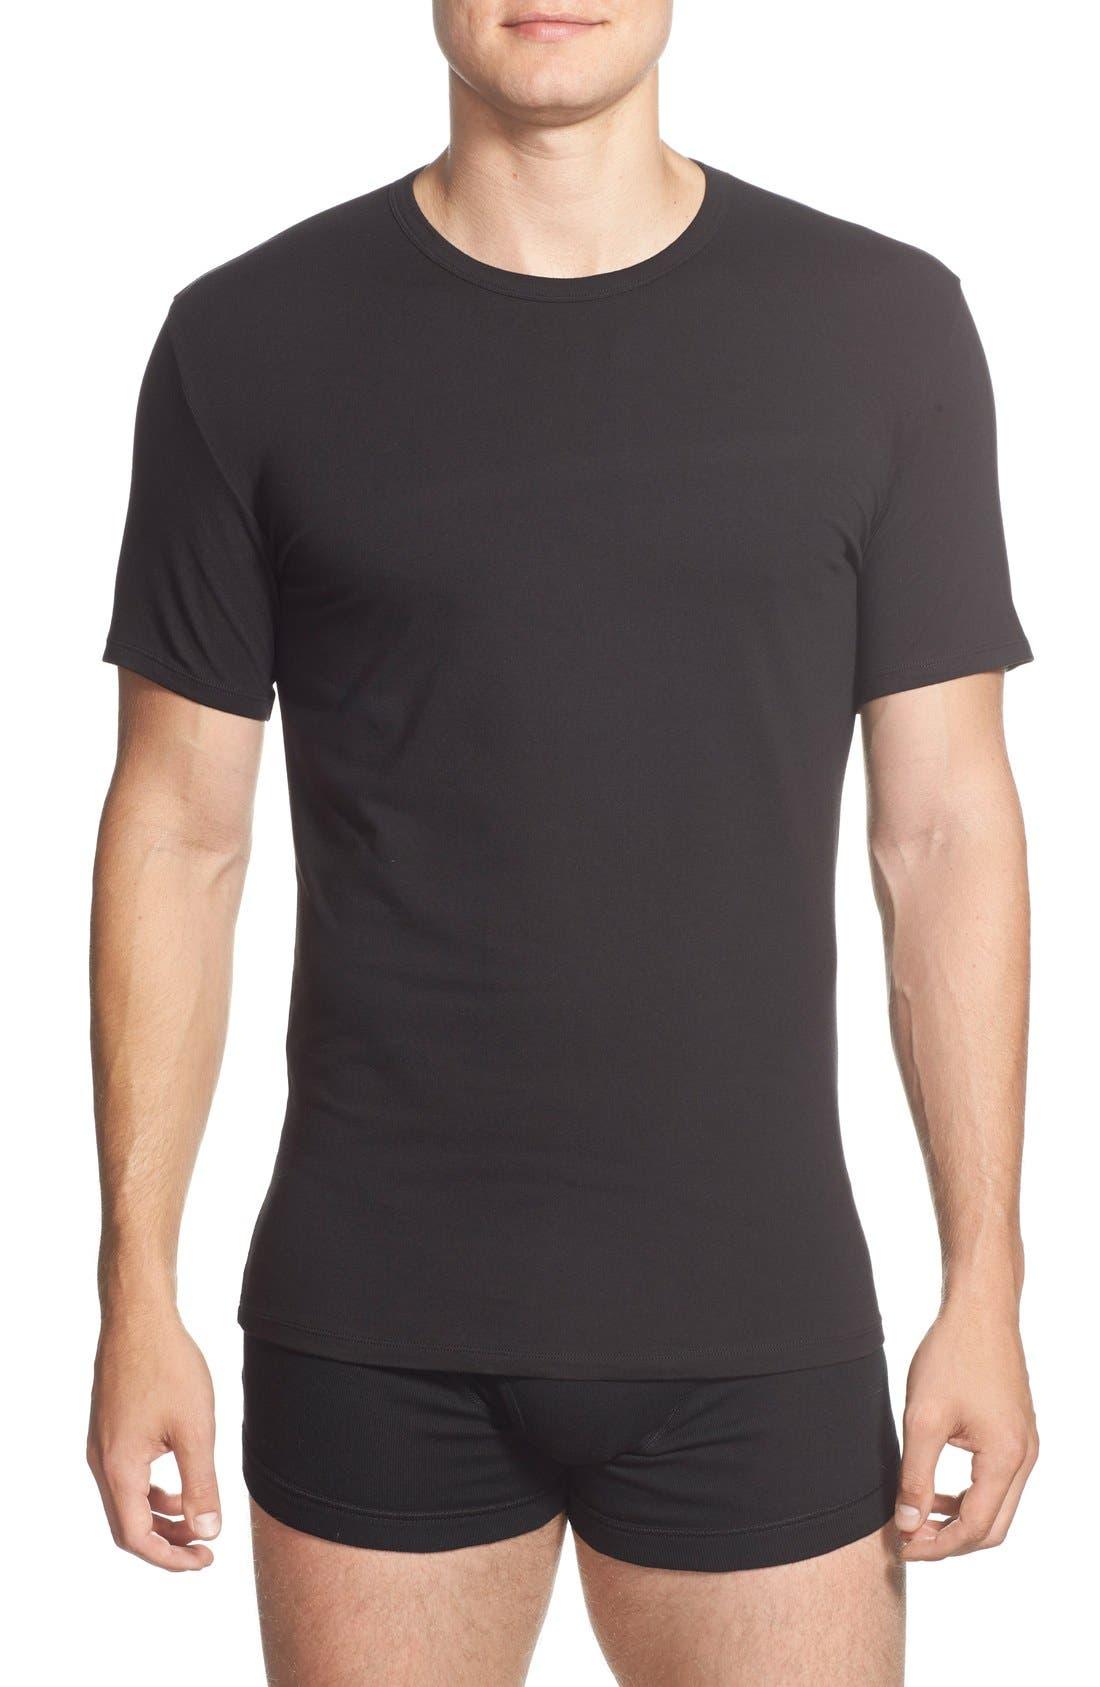 Main Image - Calvin Klein 2-Pack Stretch Cotton Crewneck T-Shirt